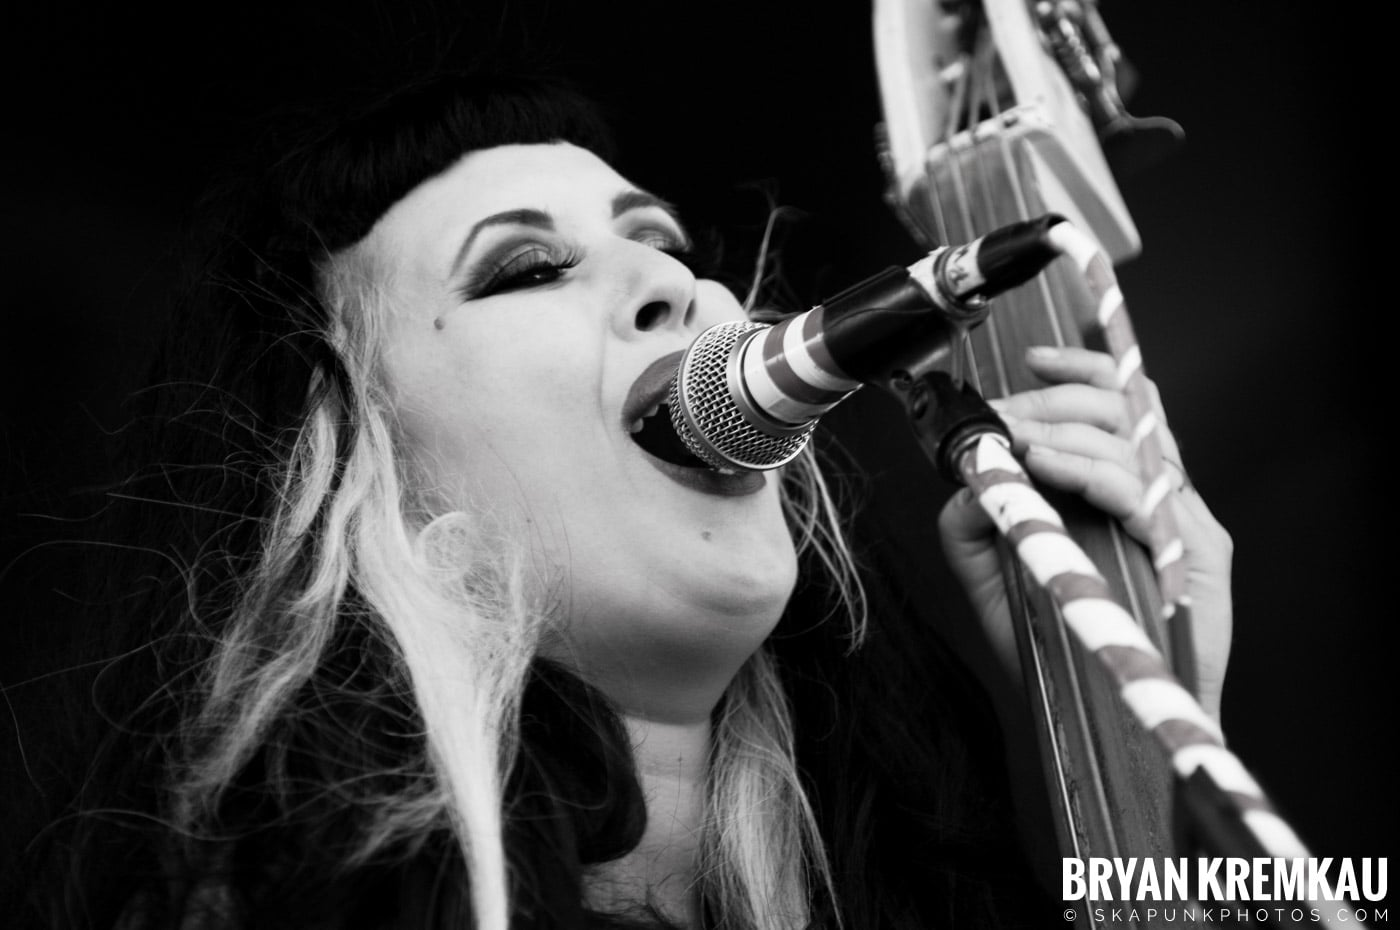 The Horrorpops @ Warped Tour 08, Scranton PA - 7.27.08 (4)